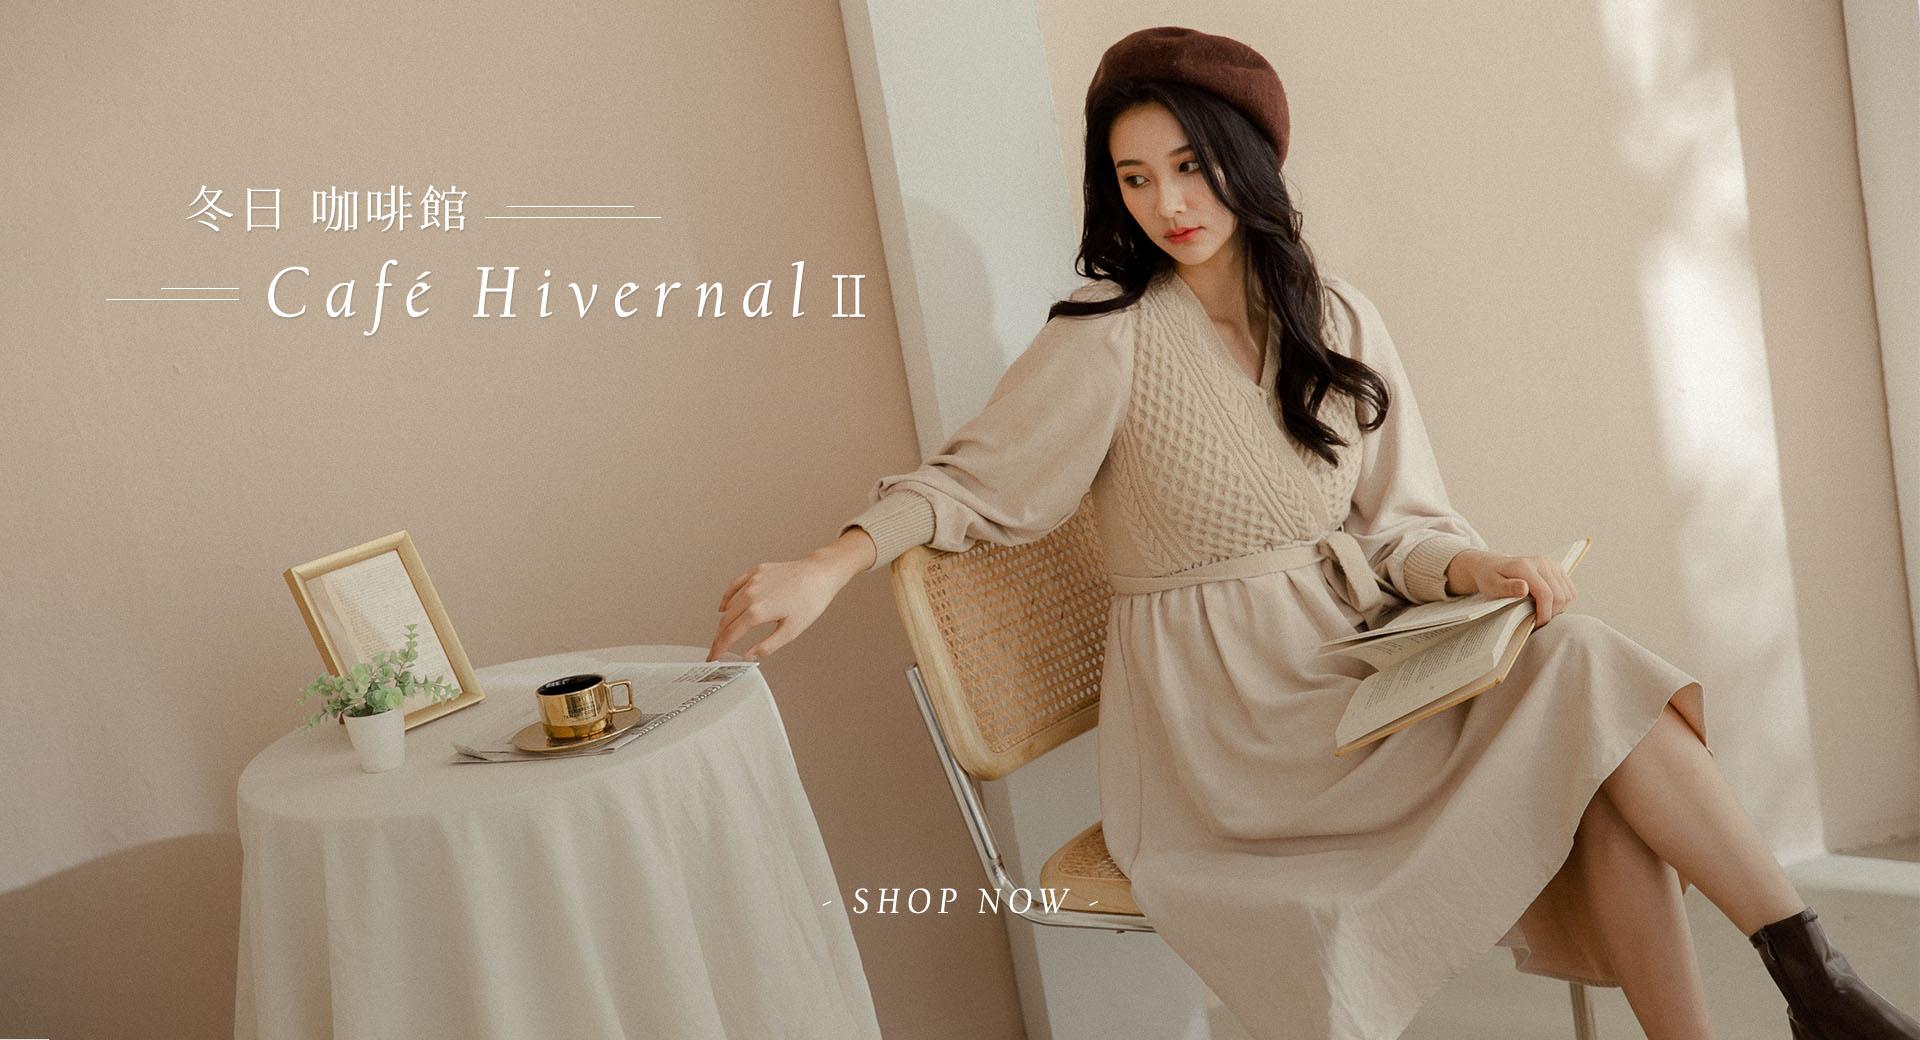 HeaderA-carousel-1